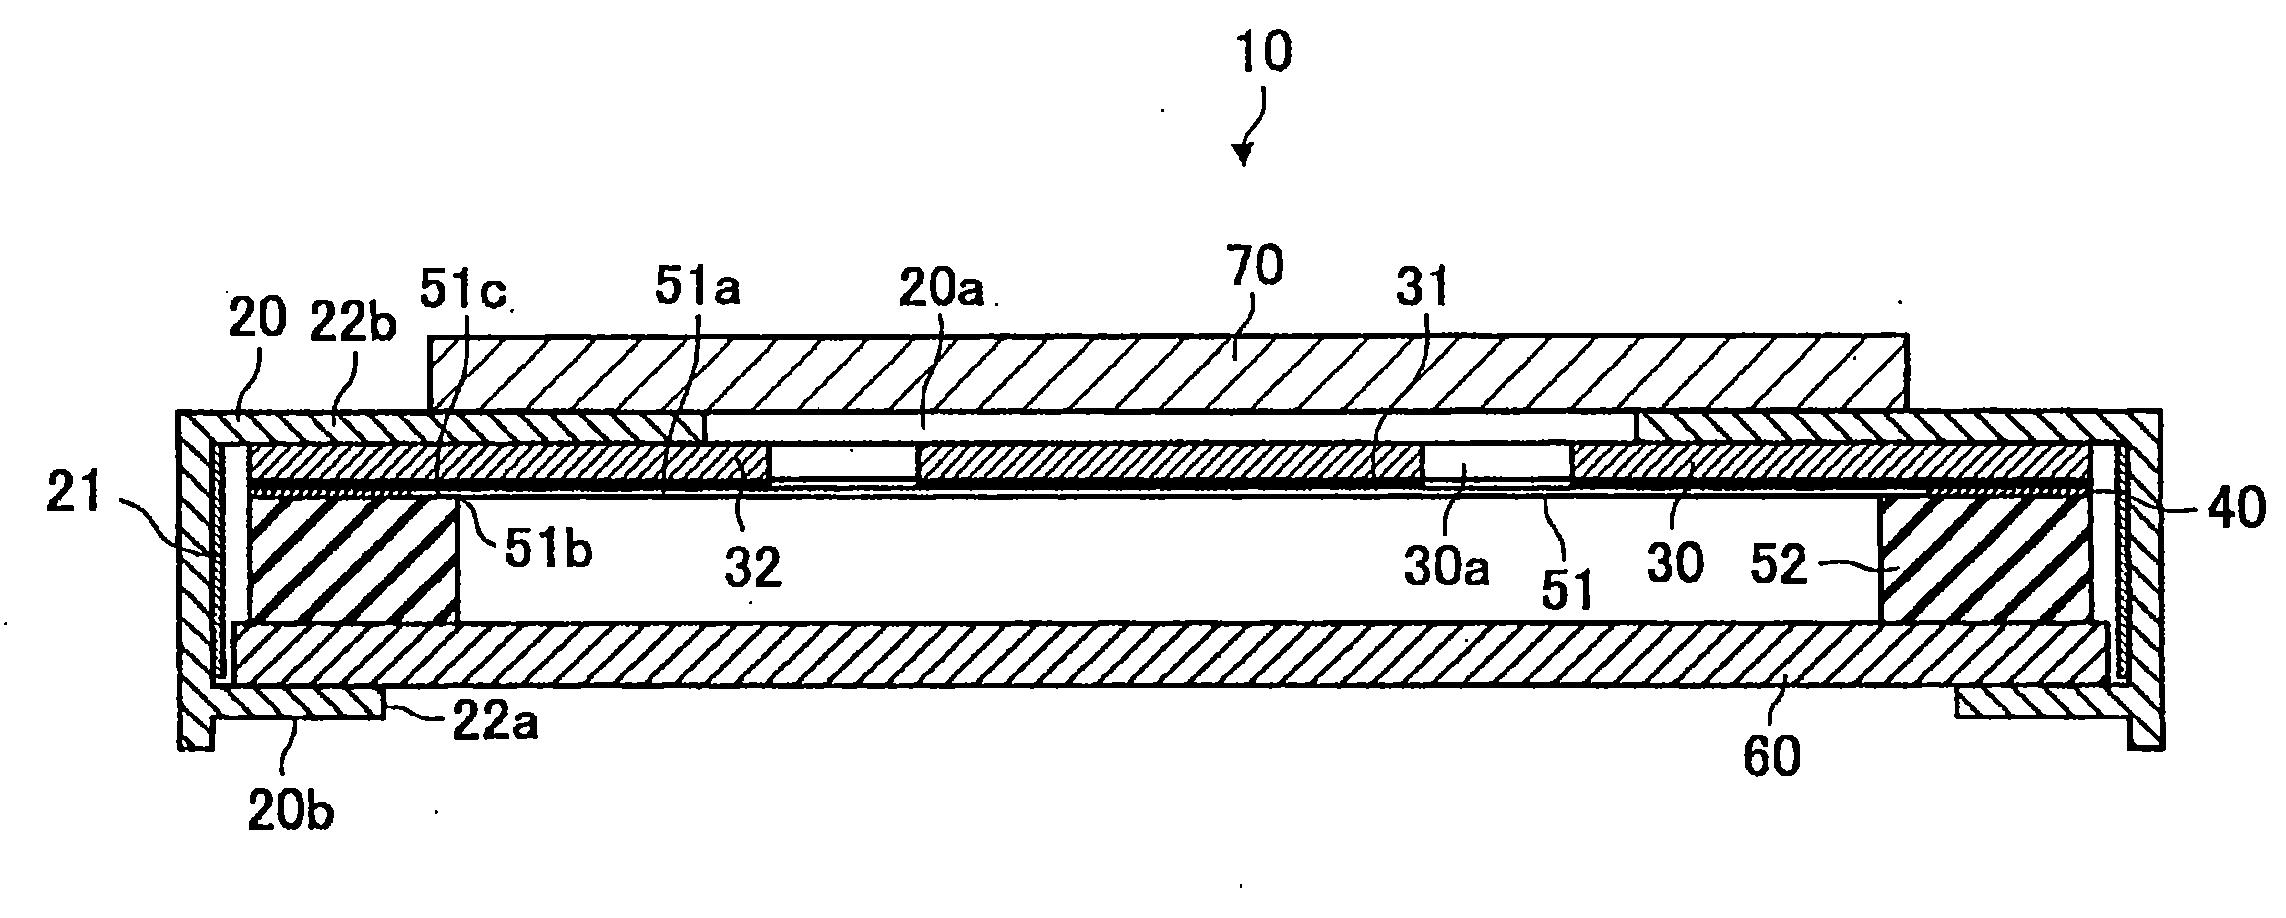 Figure 112004044278115-pct00001